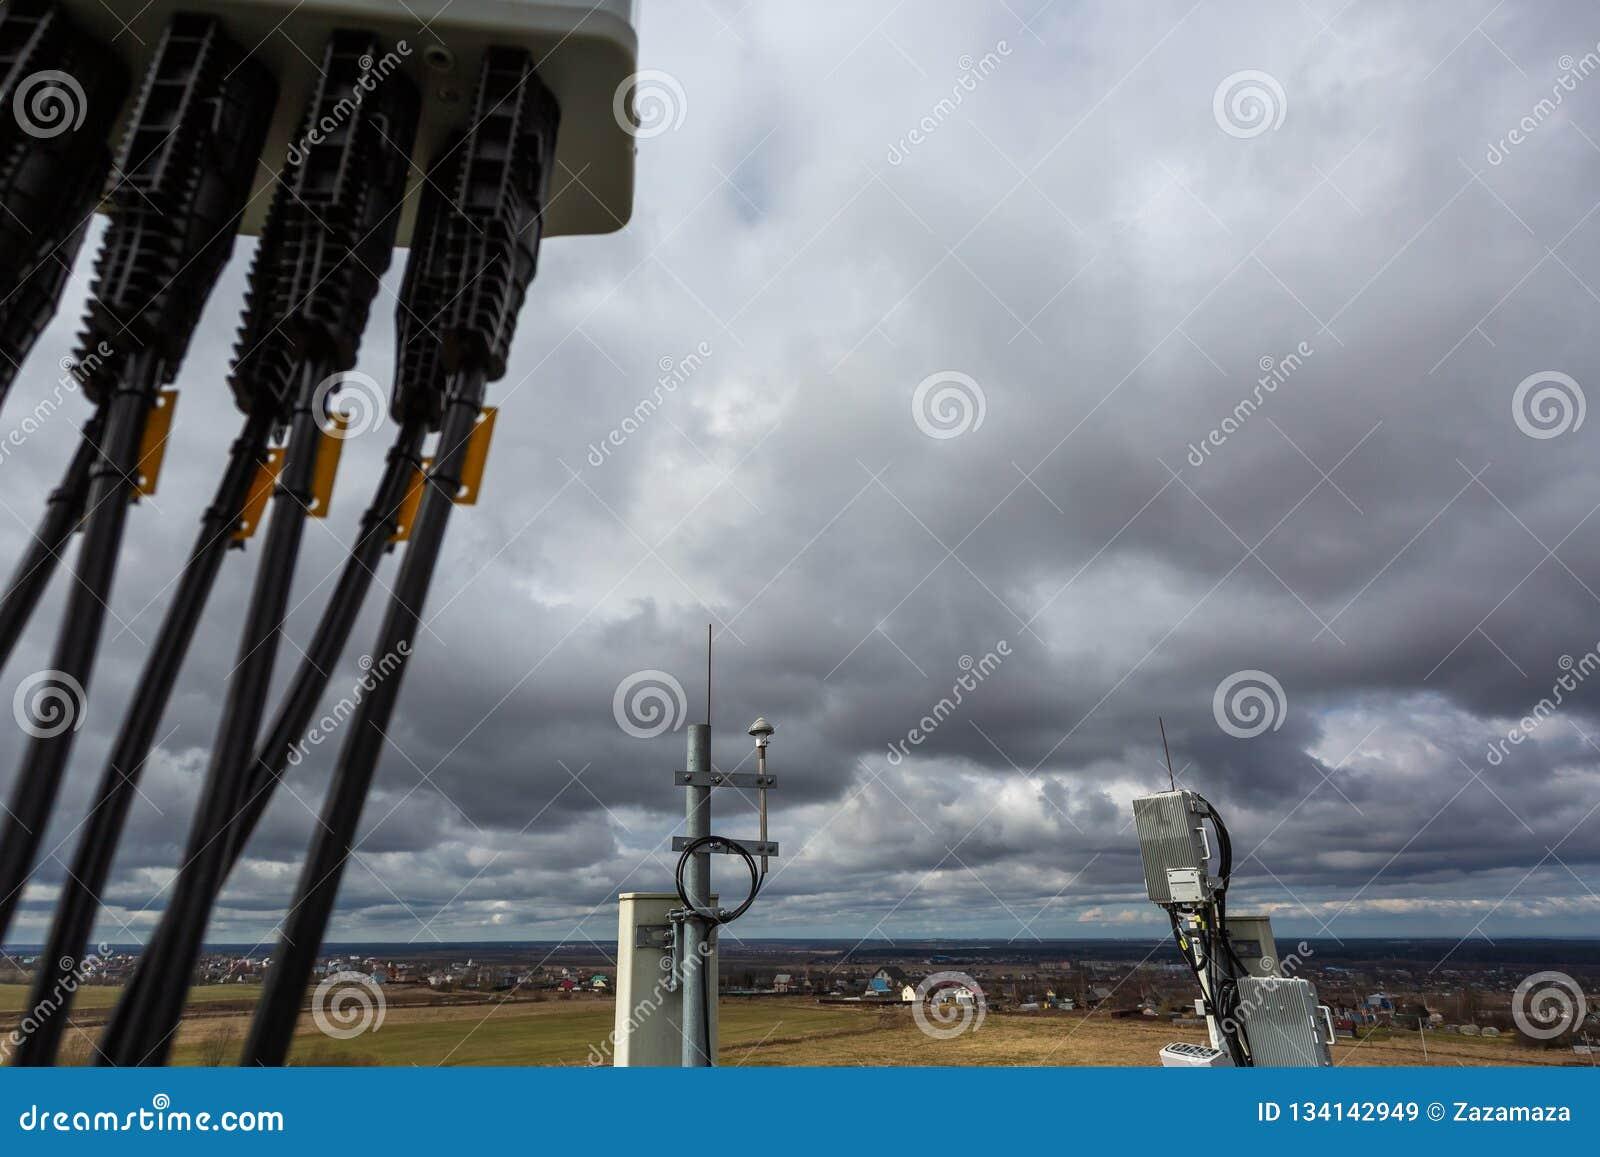 Panel Antenna Of GSM DCS UMTS LTE Bands, GPS Antenna And